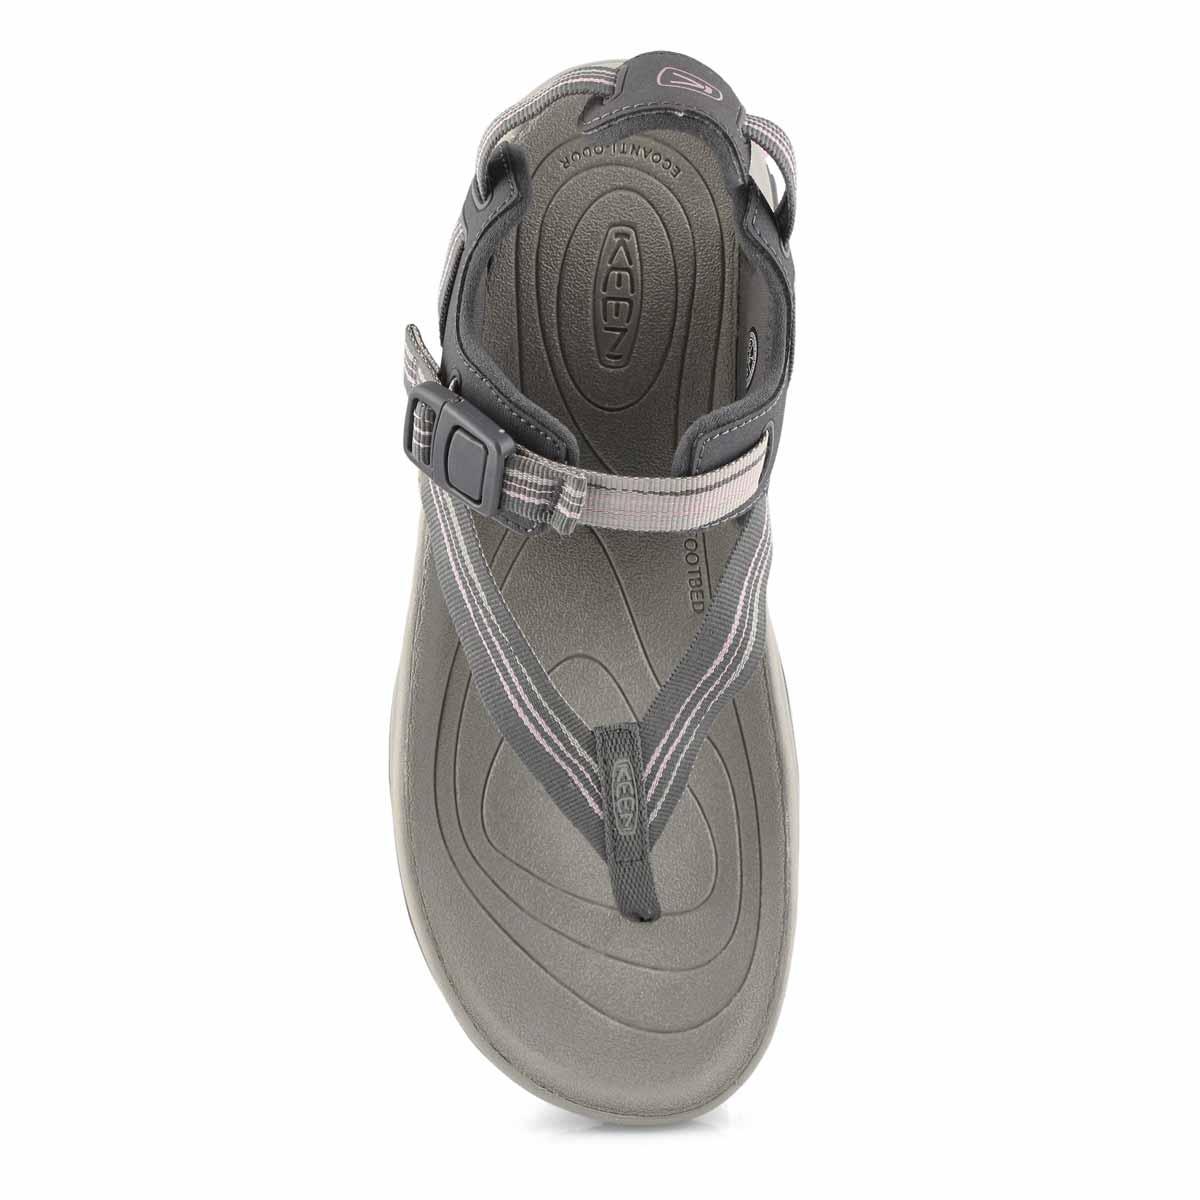 Lds Terradora II Toe Post gry/pk sandal